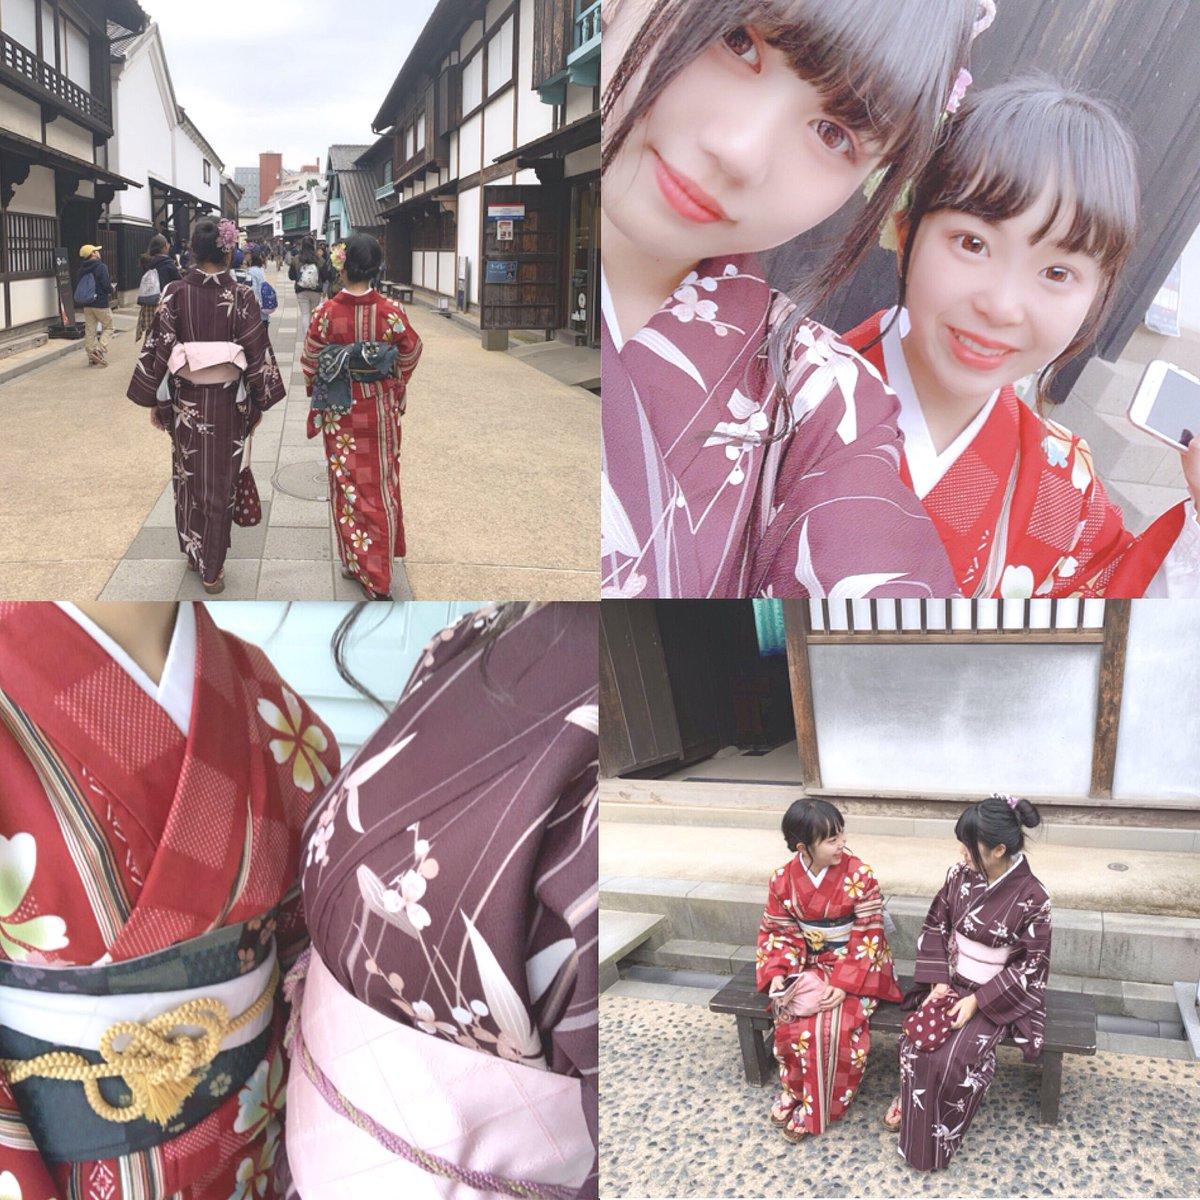 11.20 - 11.23    in kyushu 🏳️🌈いっぱい美味しいもの食べたり色んな子といっぱい写真撮ったりとにかくずっと笑ってて3日間幸せすぎた 🤤♡体調心配してくれたりみんなありがとう!!最高の思い出になりました 🥀